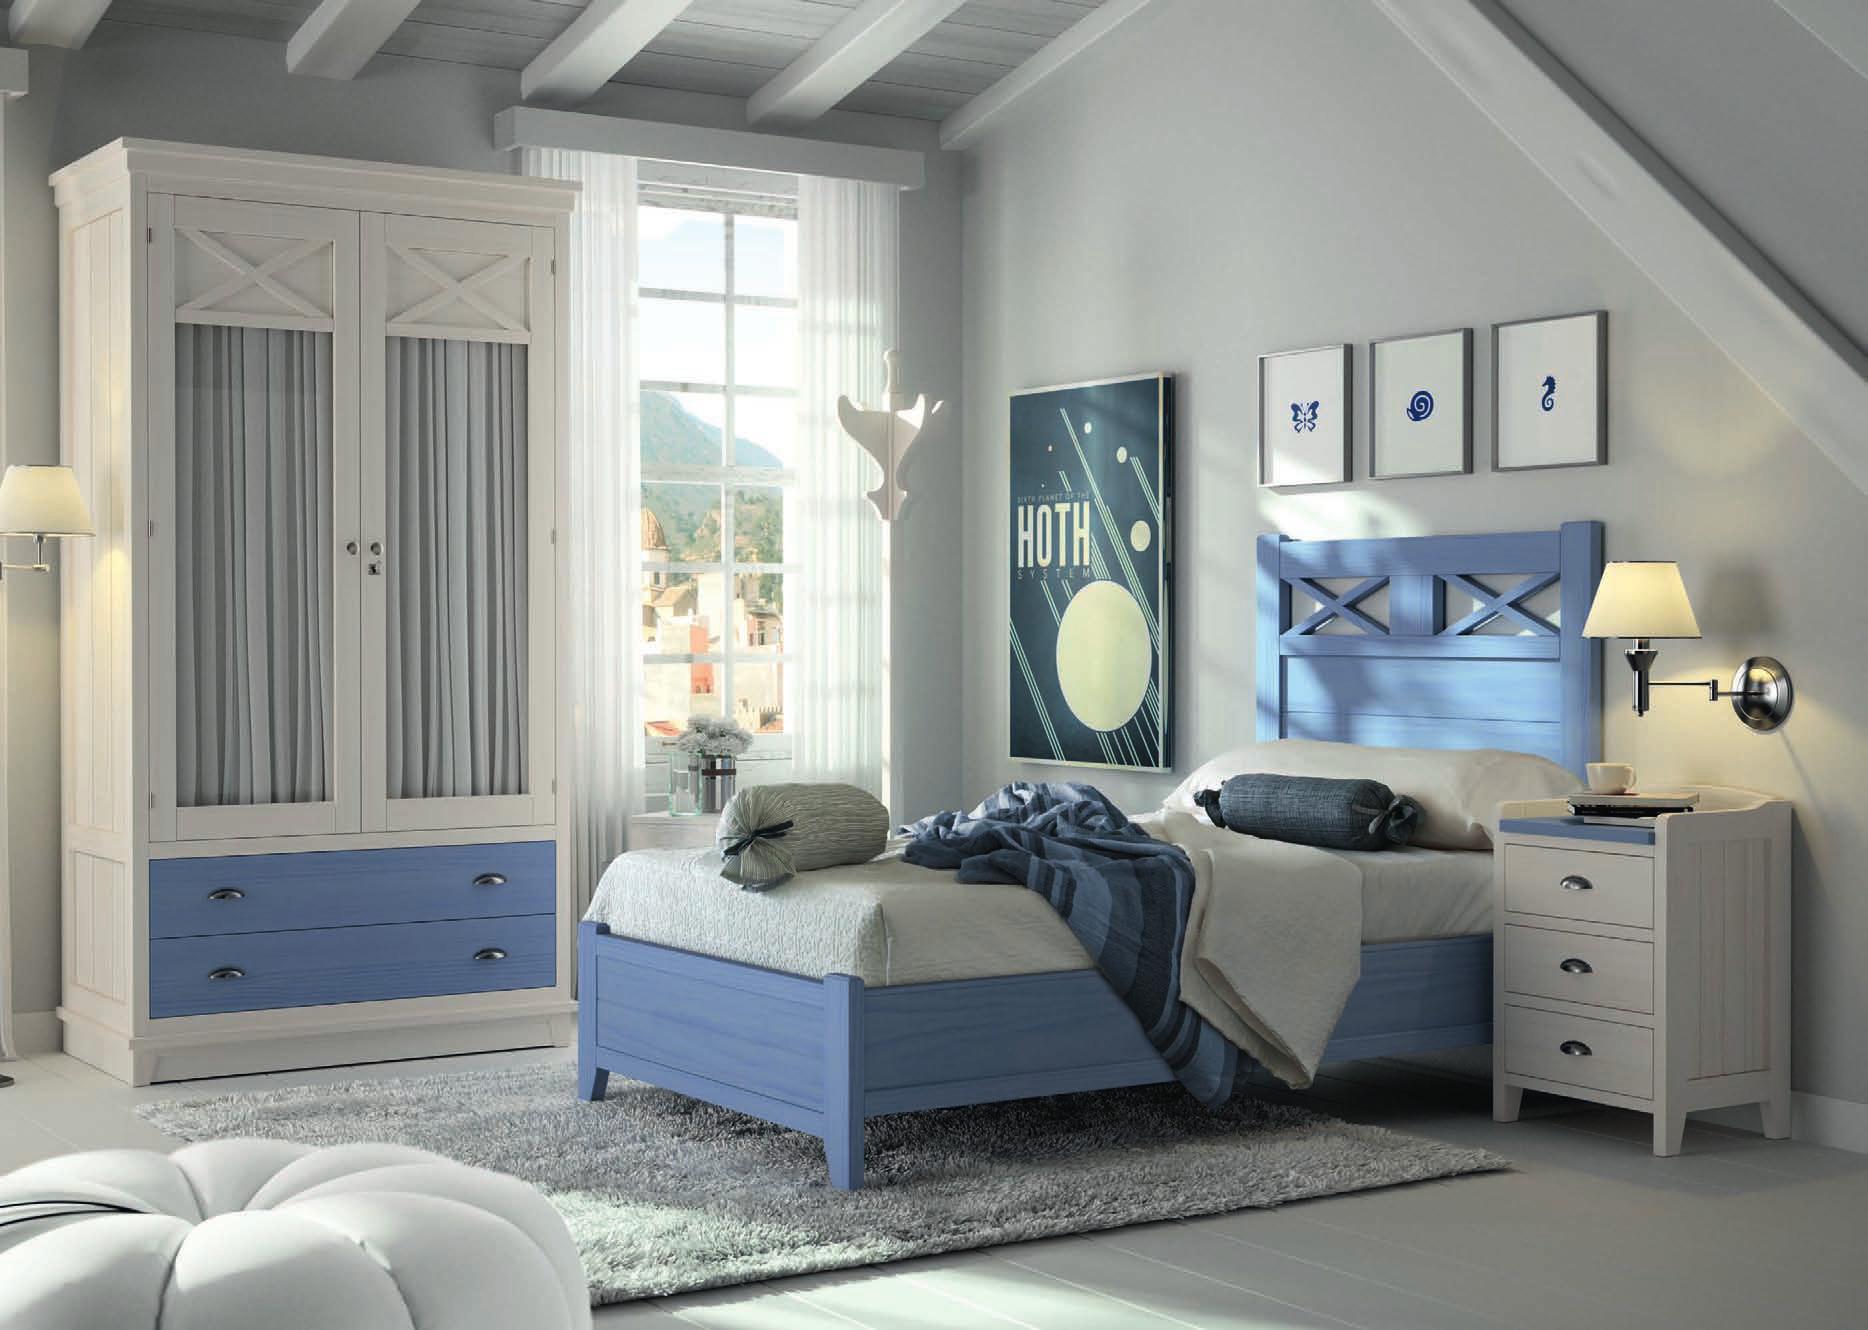 416-dormitorio-j-44